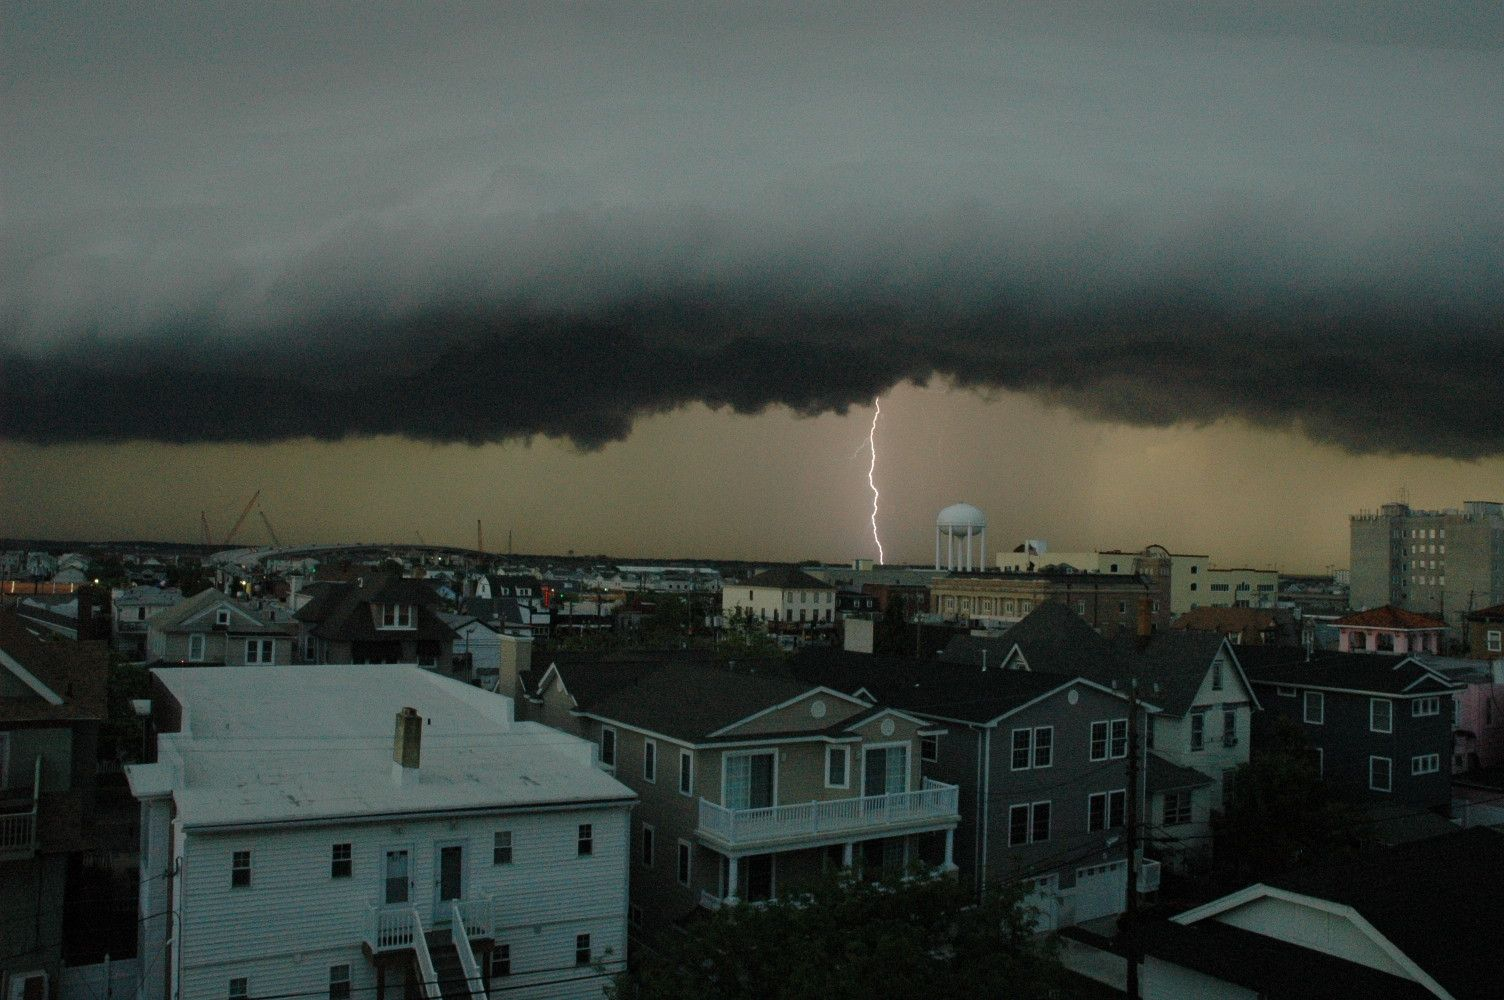 Lightning strike during storm in Ocean City, New Jersey | Hurricane